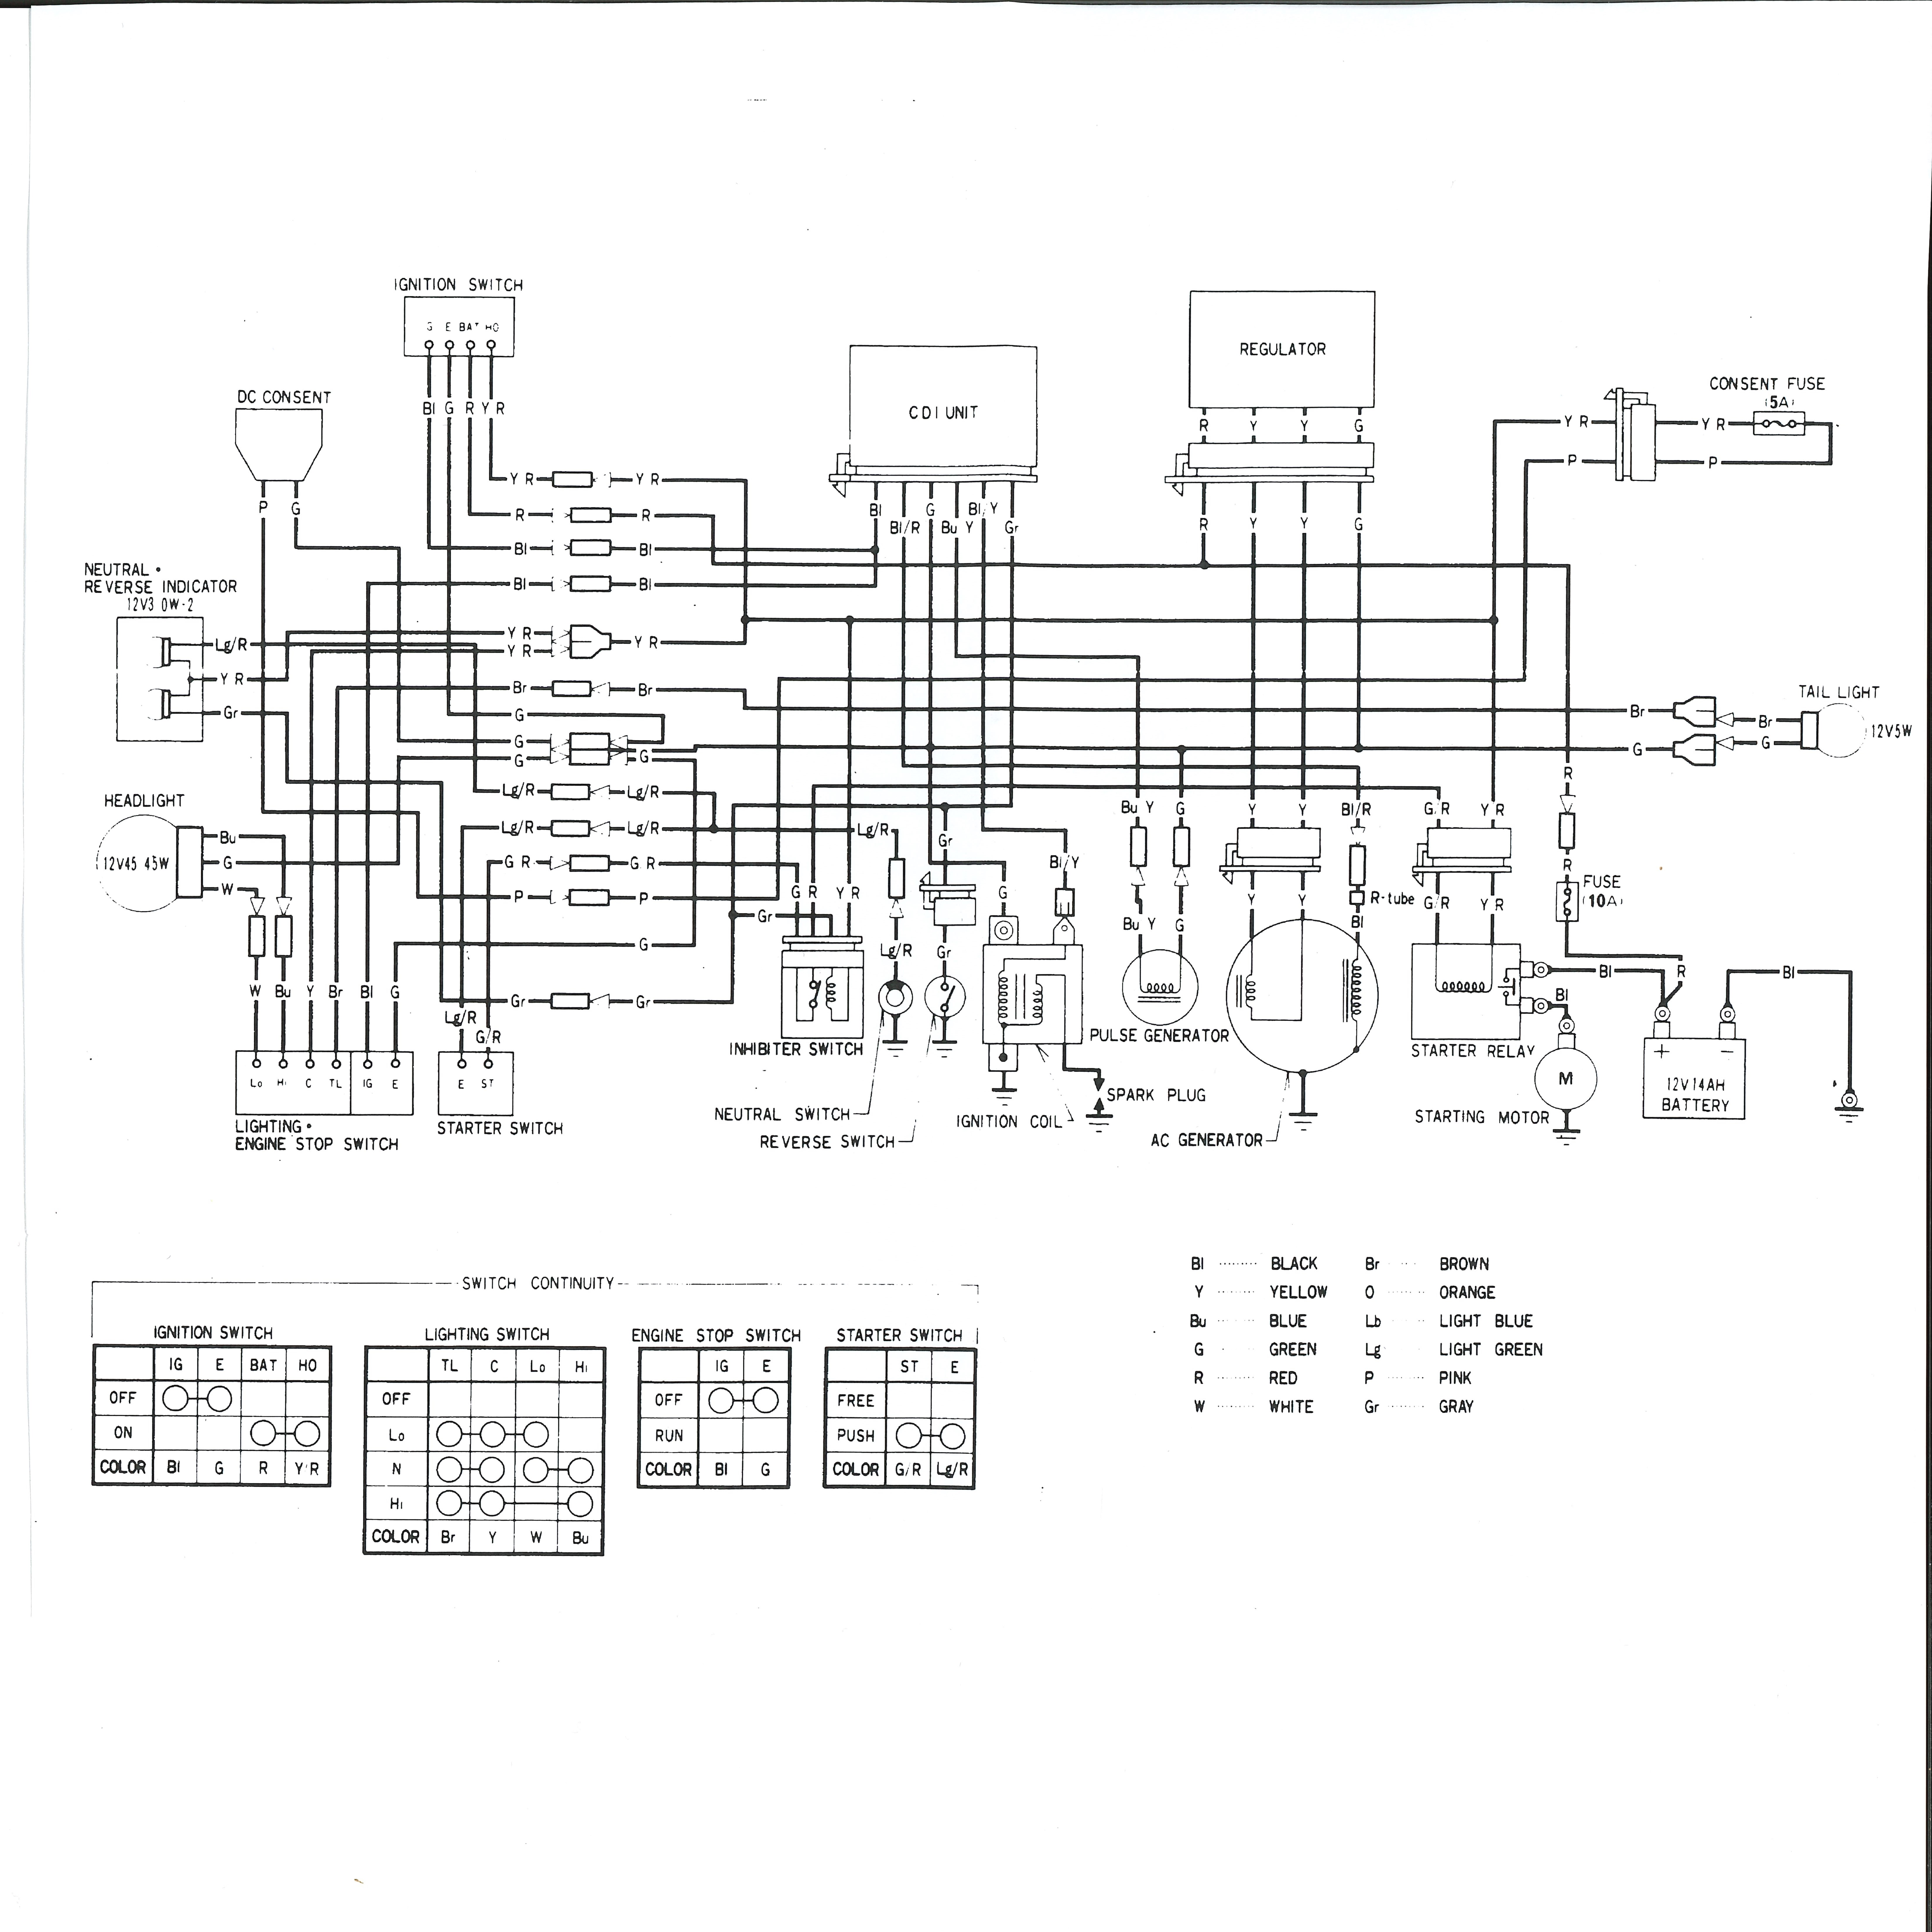 Honda 200x Cdi Wiring Diagram Subaru Impreza Engine Wiring Diagram 1991rx7 Geli Geli Operazionerestauro It